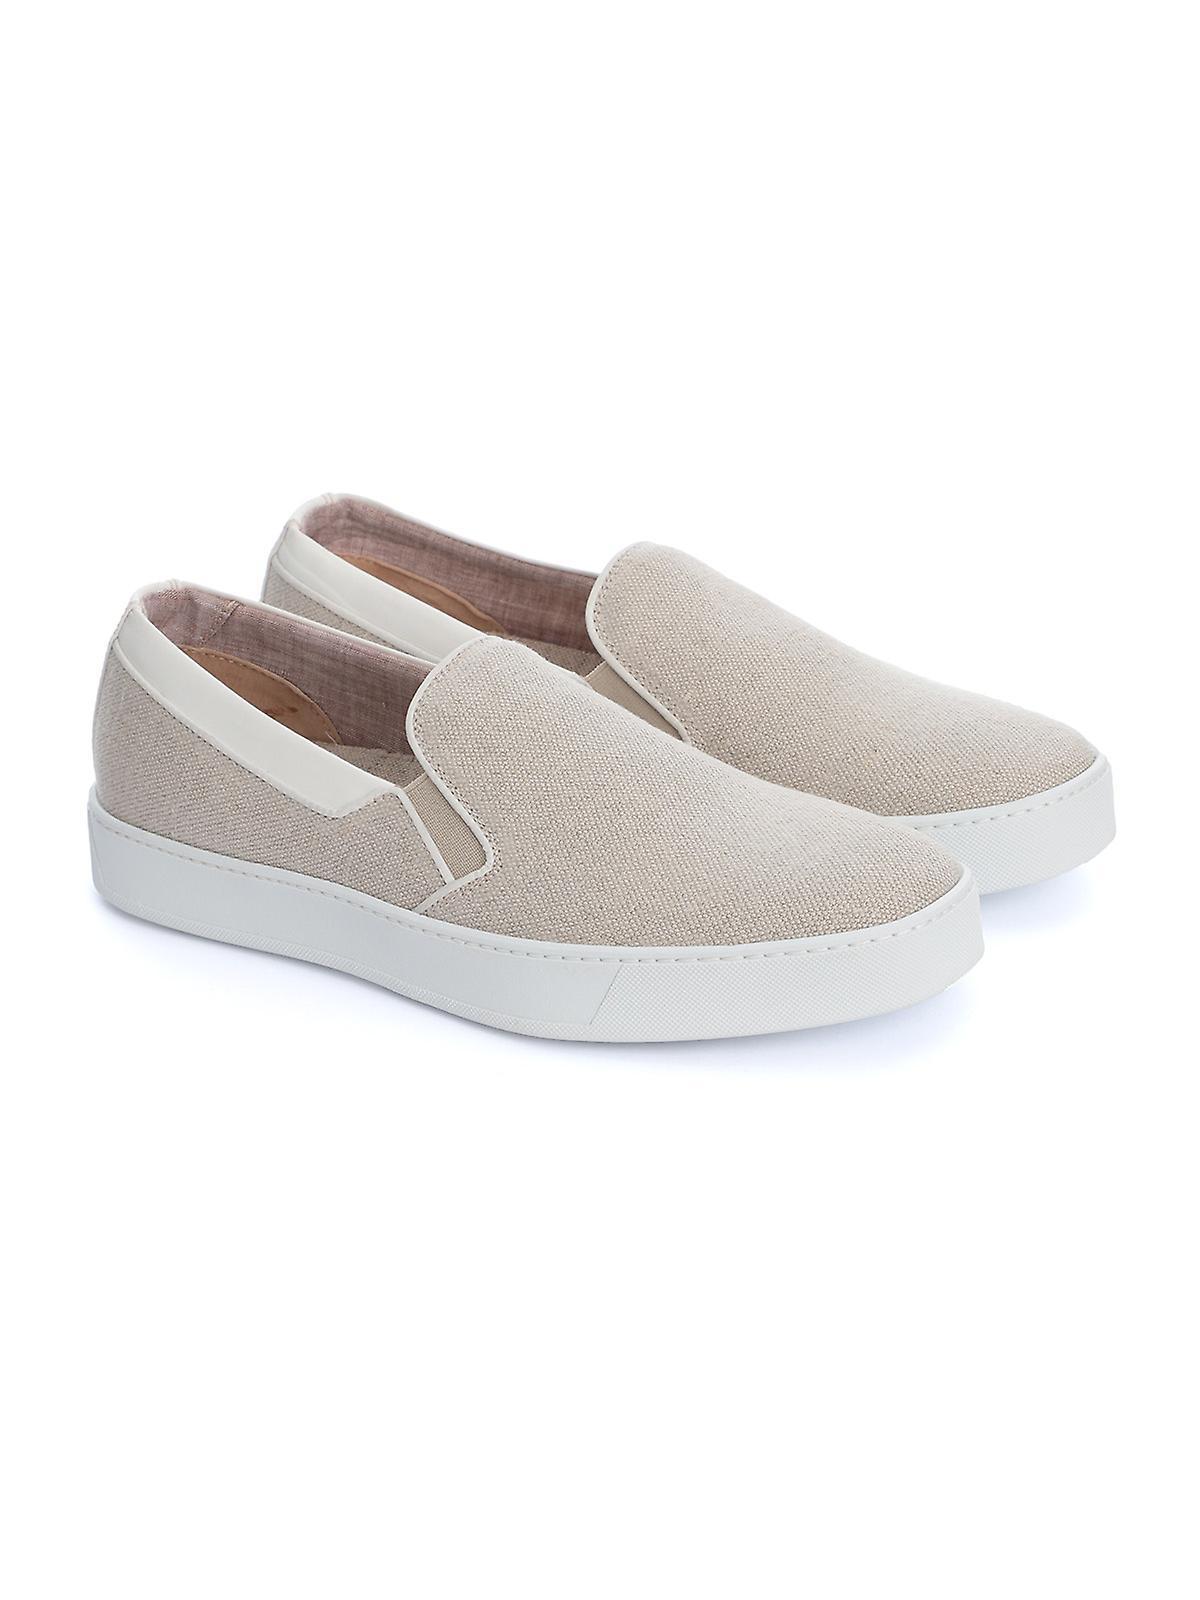 Corneliani 85tm610120926036 Uomini's Beige Lino Slip On Sneakers 8OE8aF